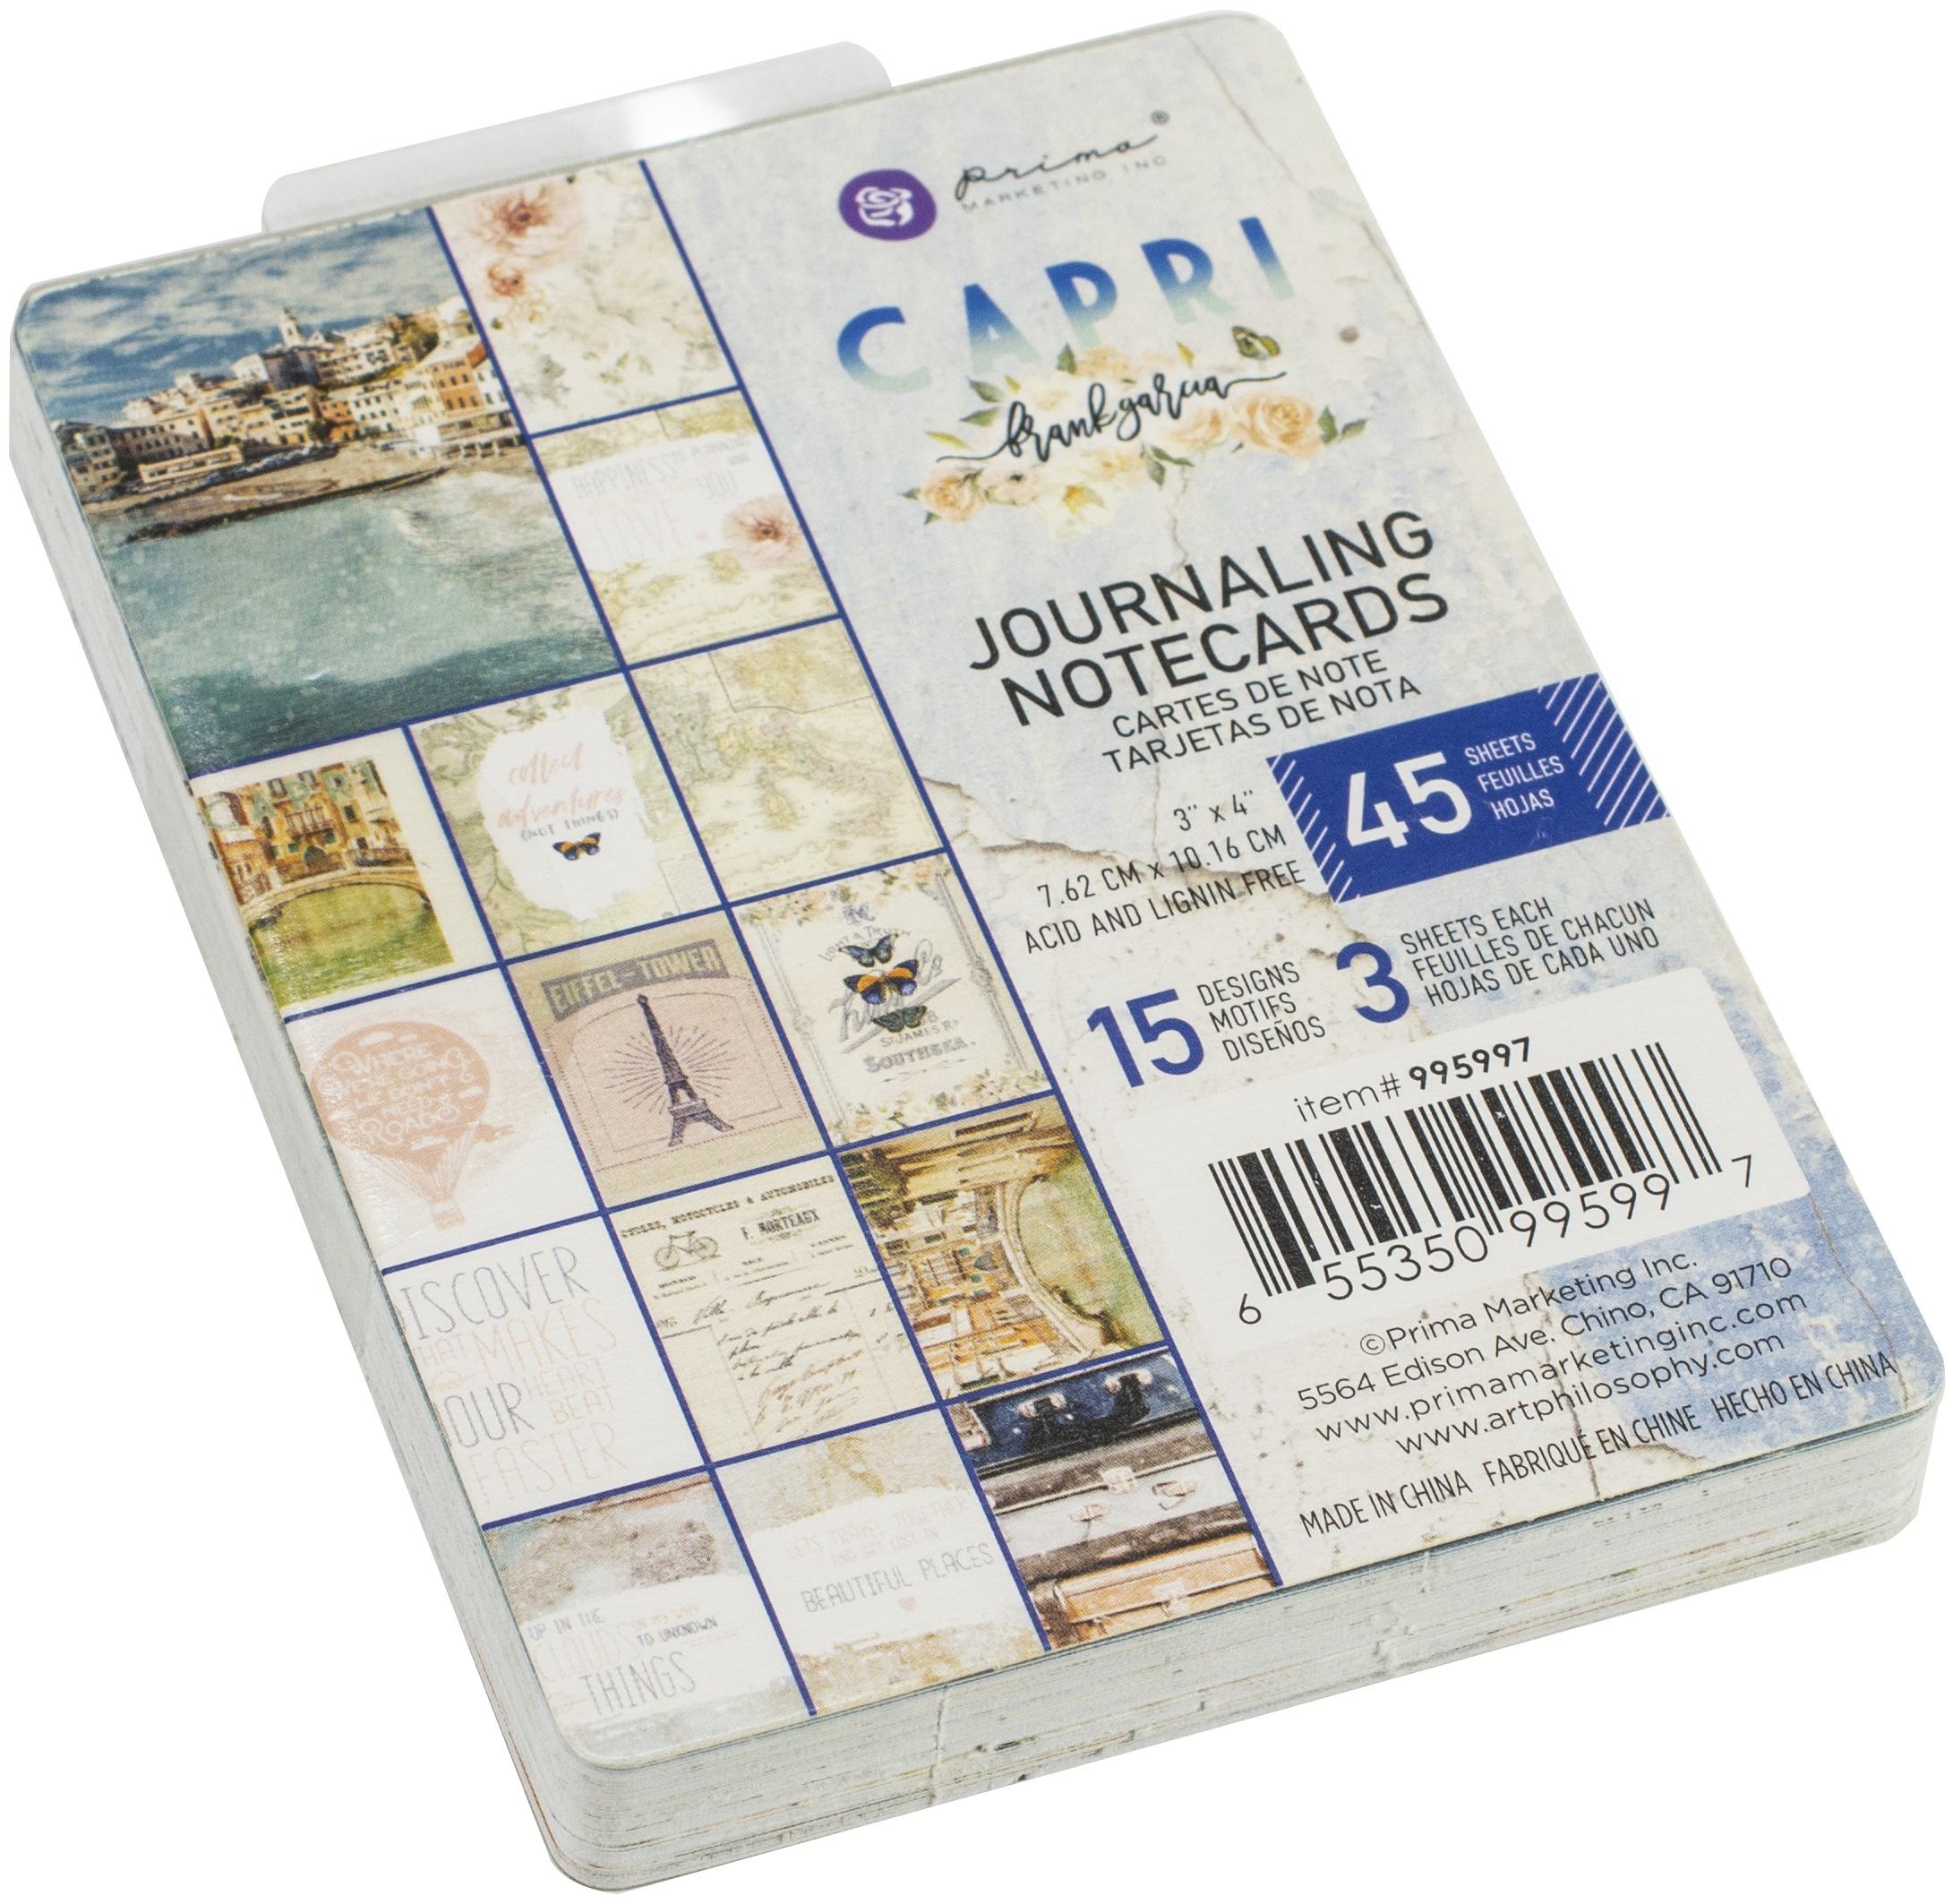 Capri Journaling Cards 3X4